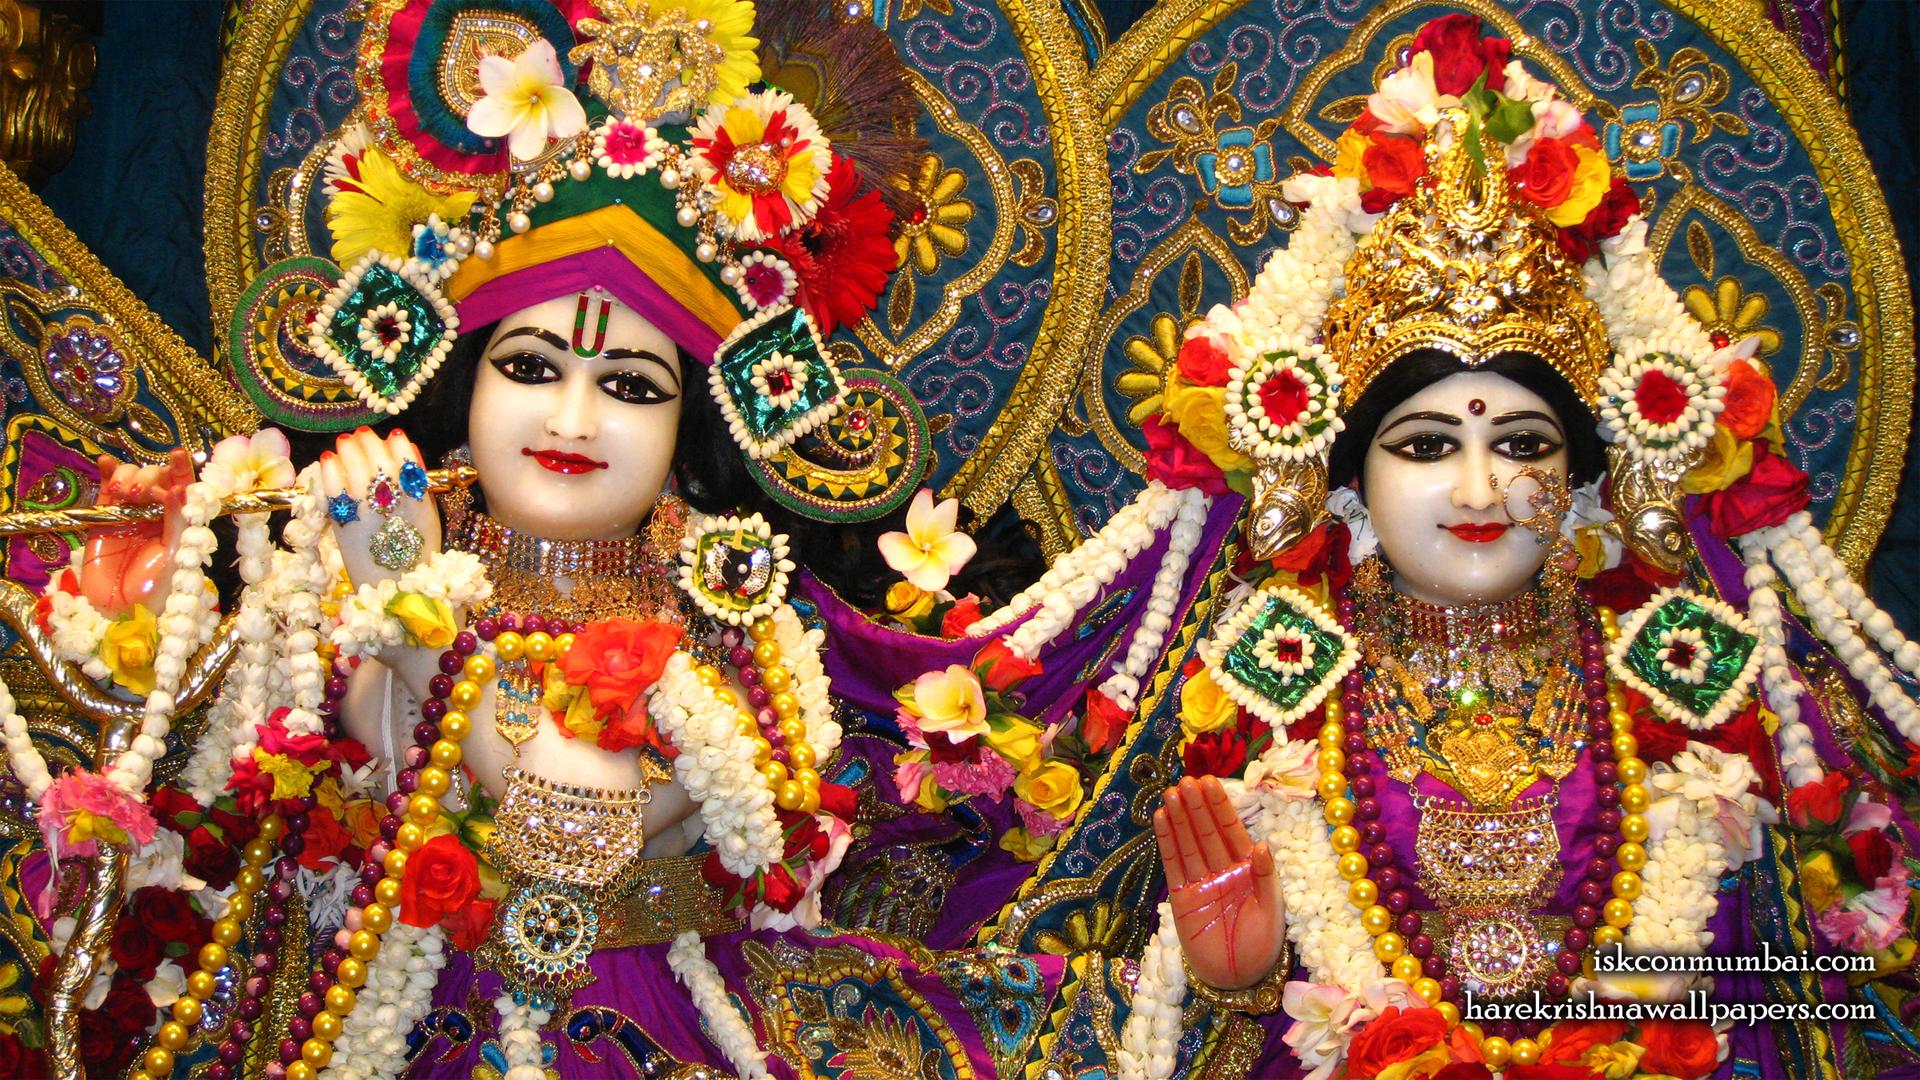 Sri Sri Radha Rasabihari Close up Wallpaper (010) Size 1920x1080 Download